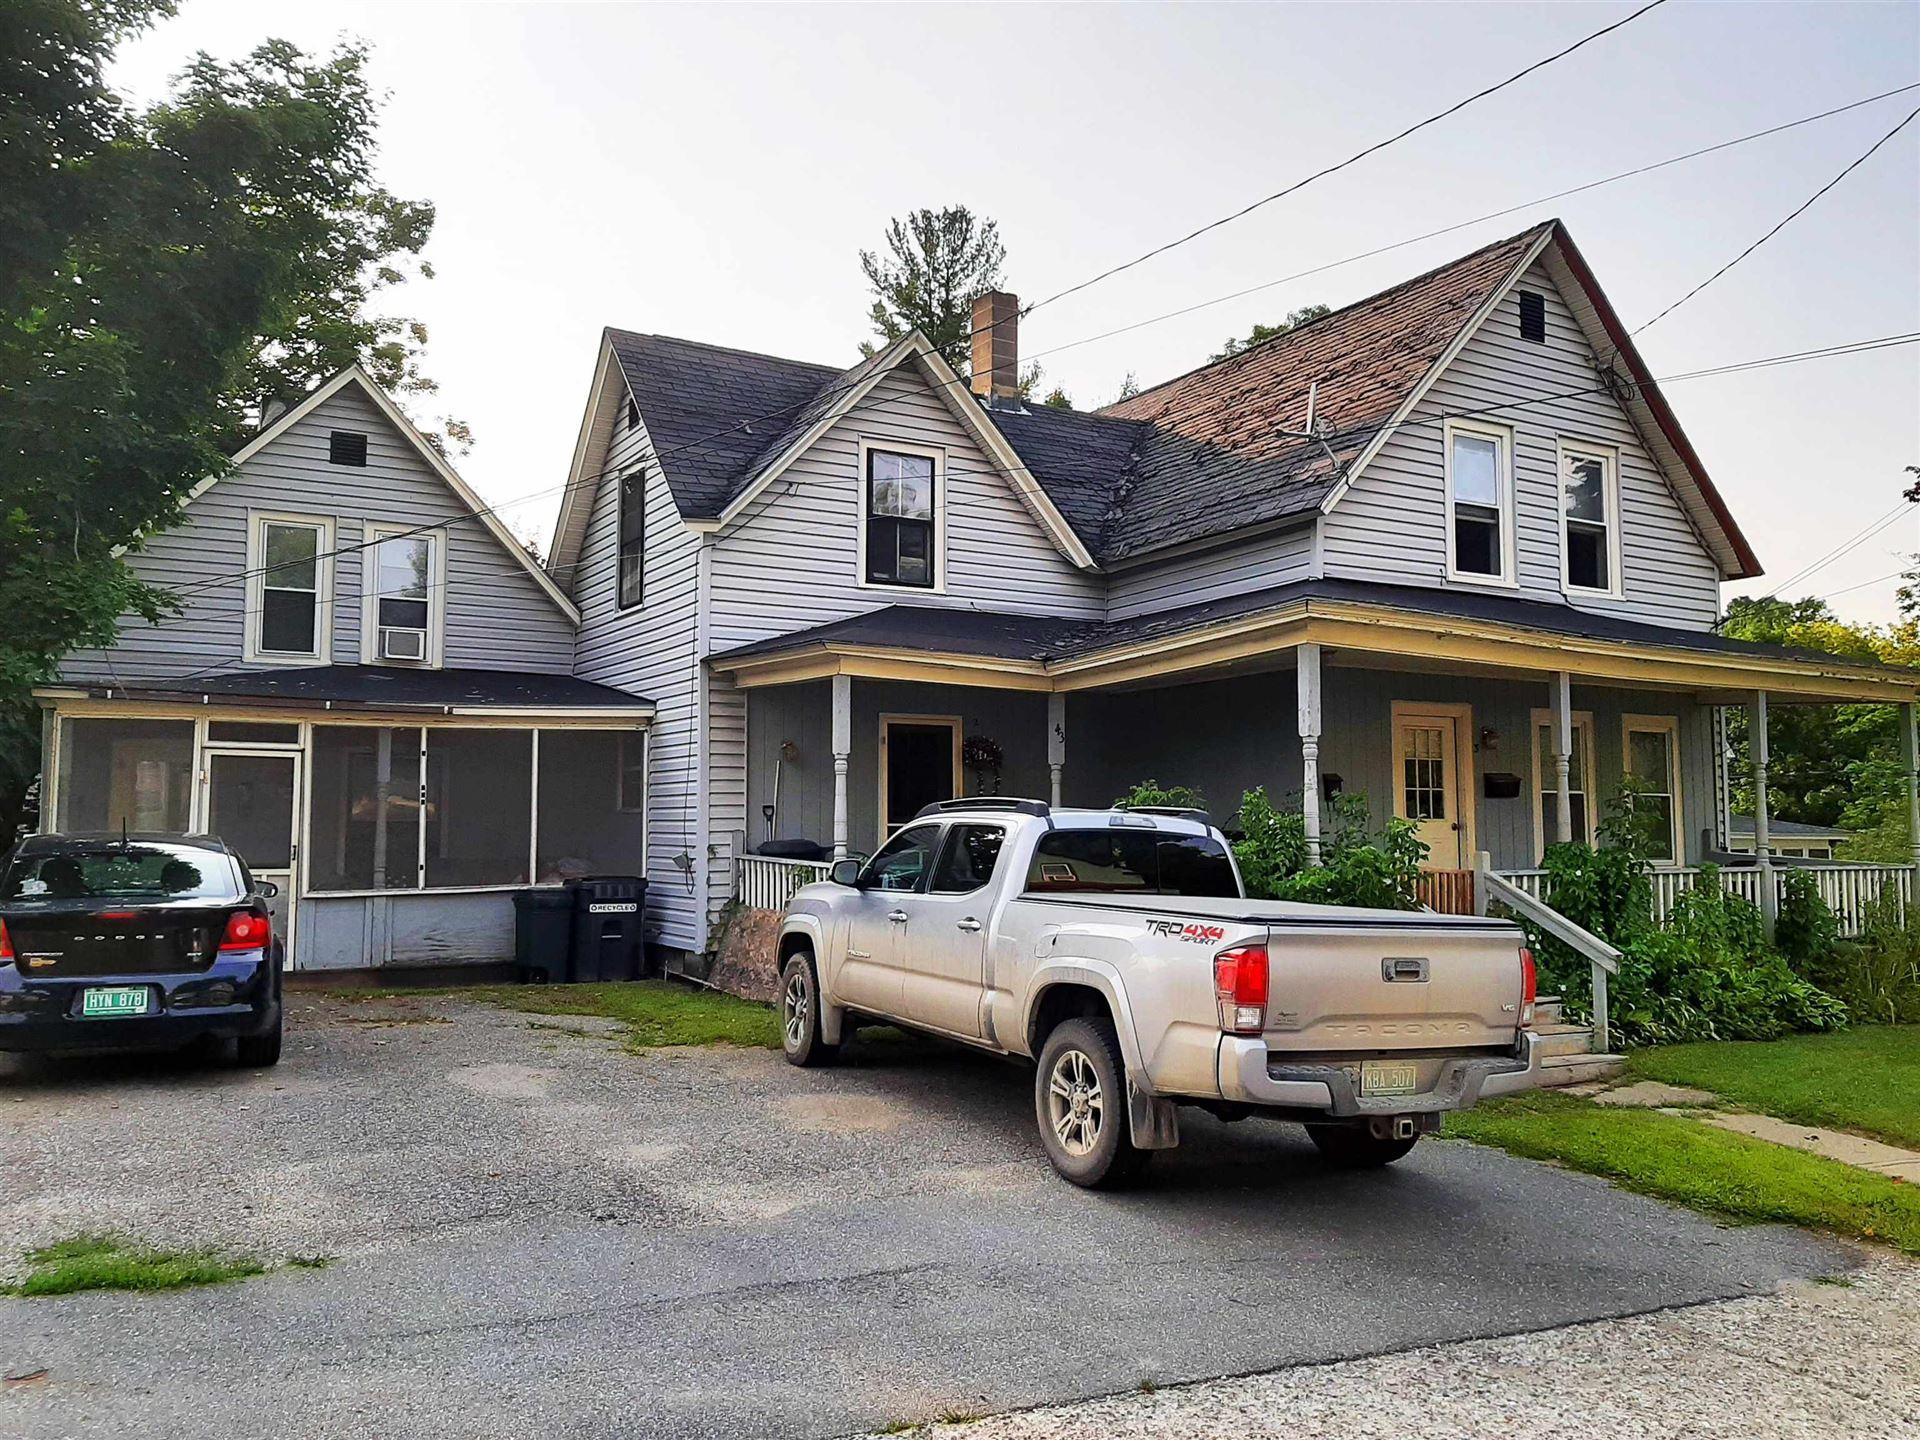 43 Indian Point Street, Newport, VT 05855 - MLS#: 4878683